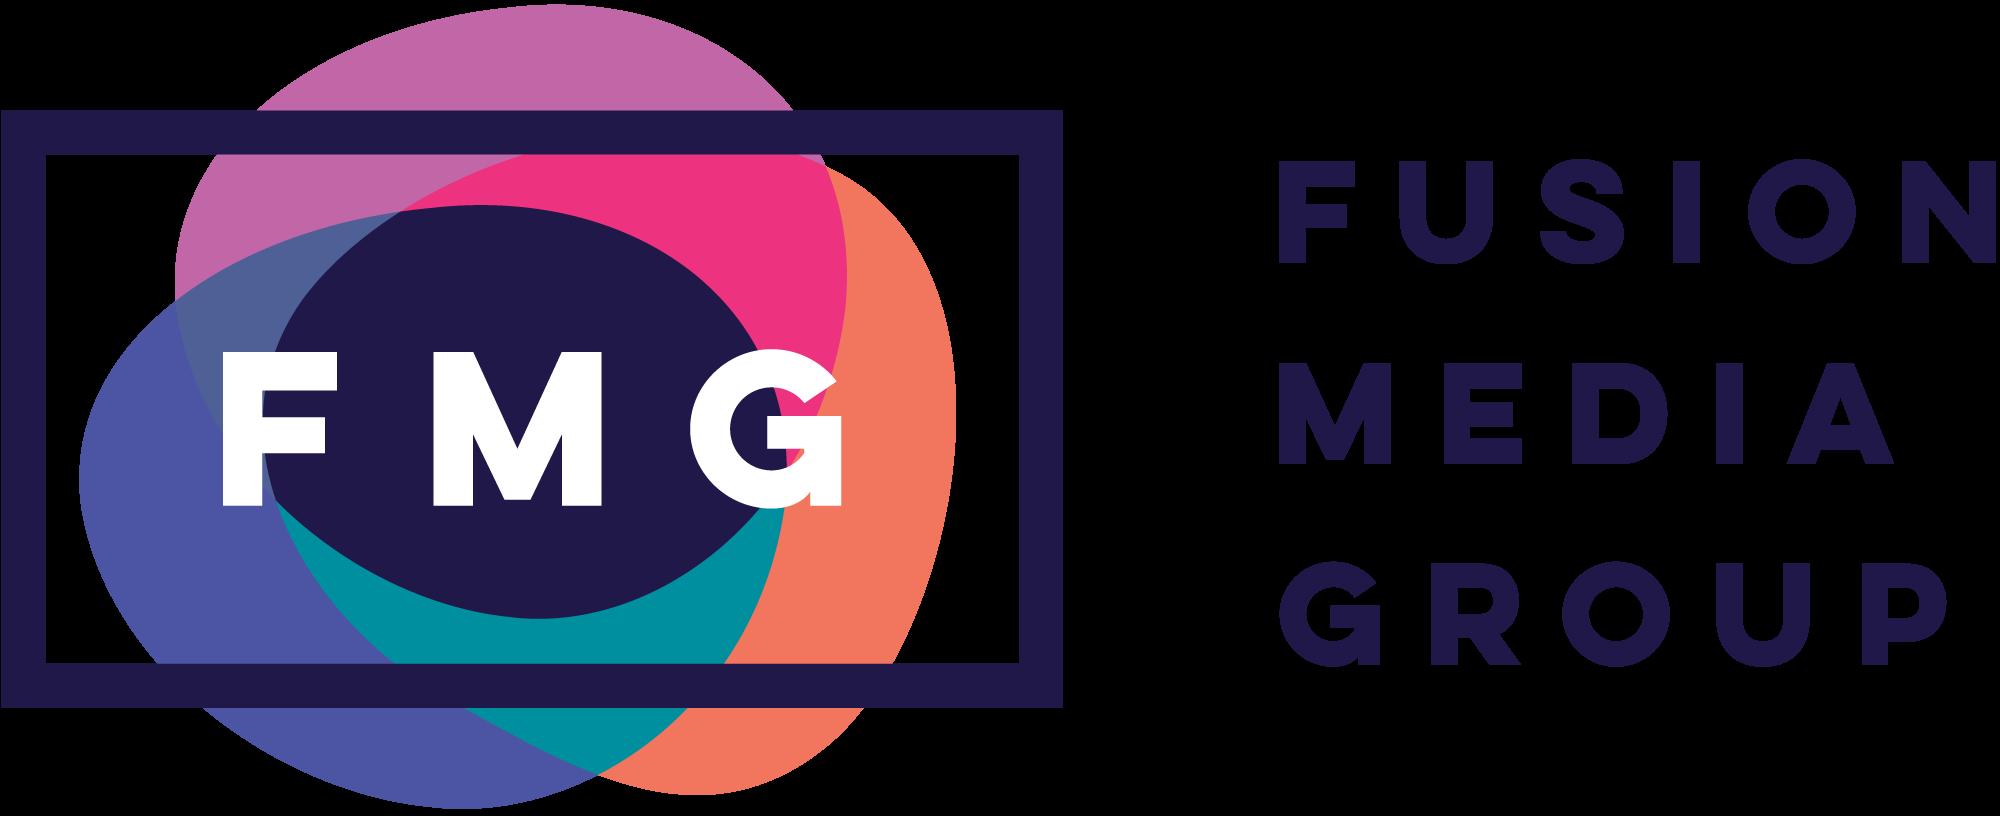 Fmg logo darktext horizontal